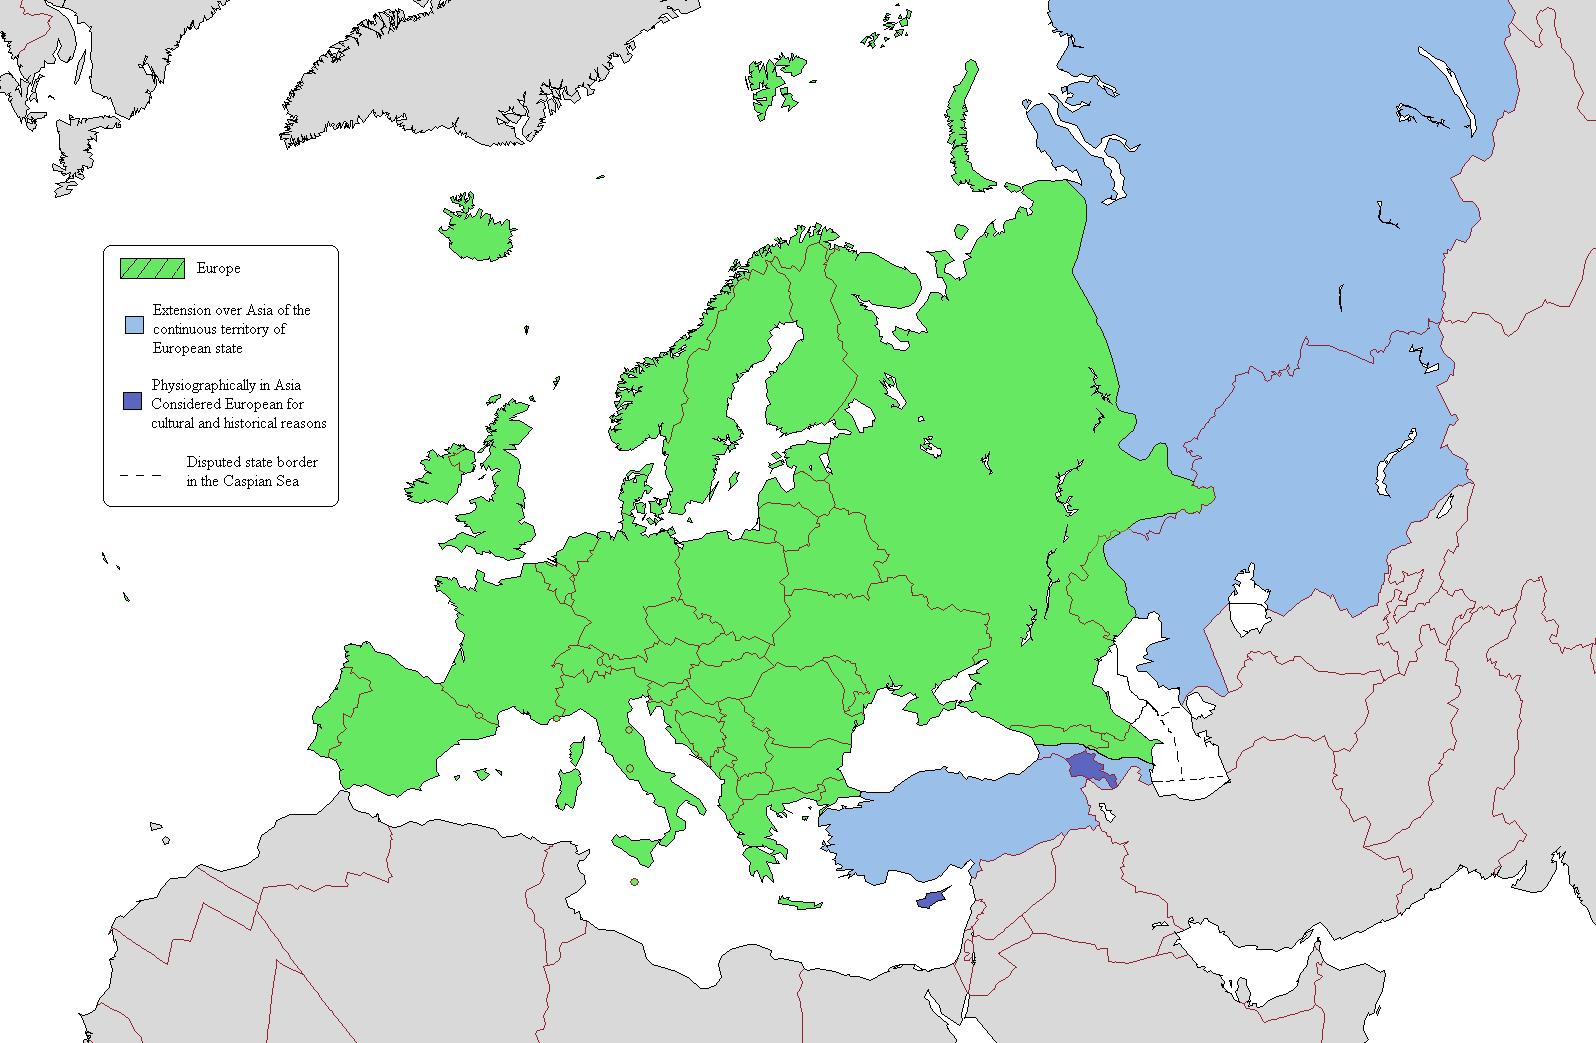 Fileeurope political mapg wikimedia commons fileeurope political mapg gumiabroncs Choice Image